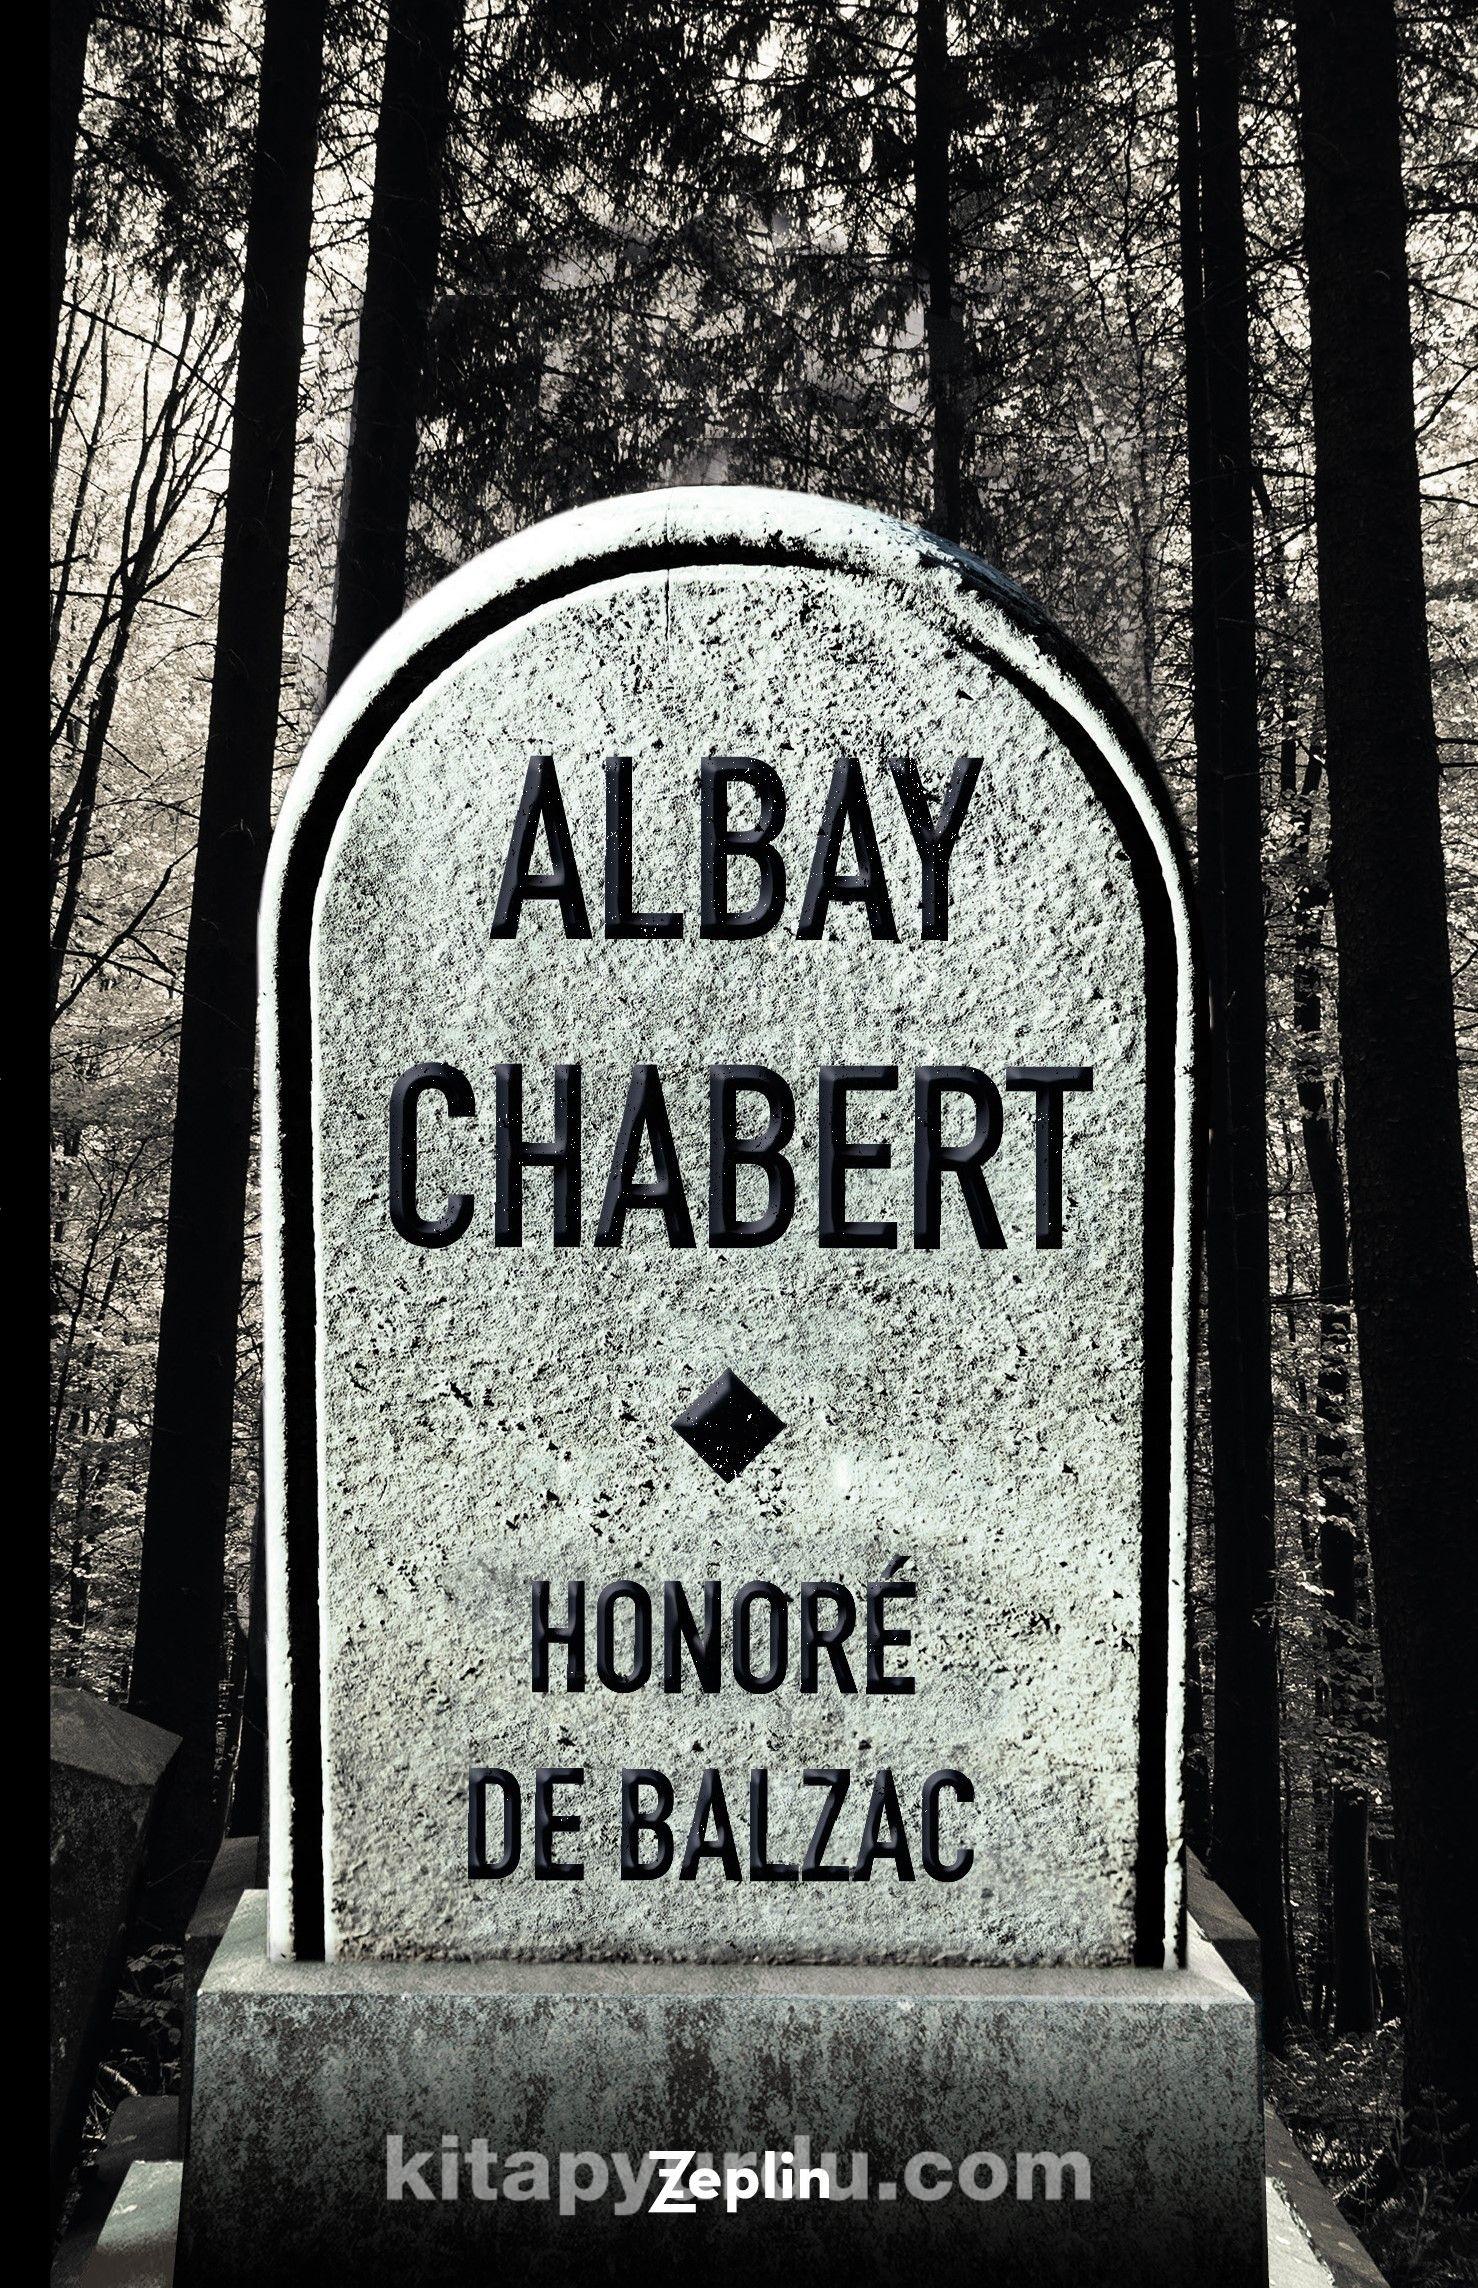 Albay Chabert - Honore de Balzac pdf epub